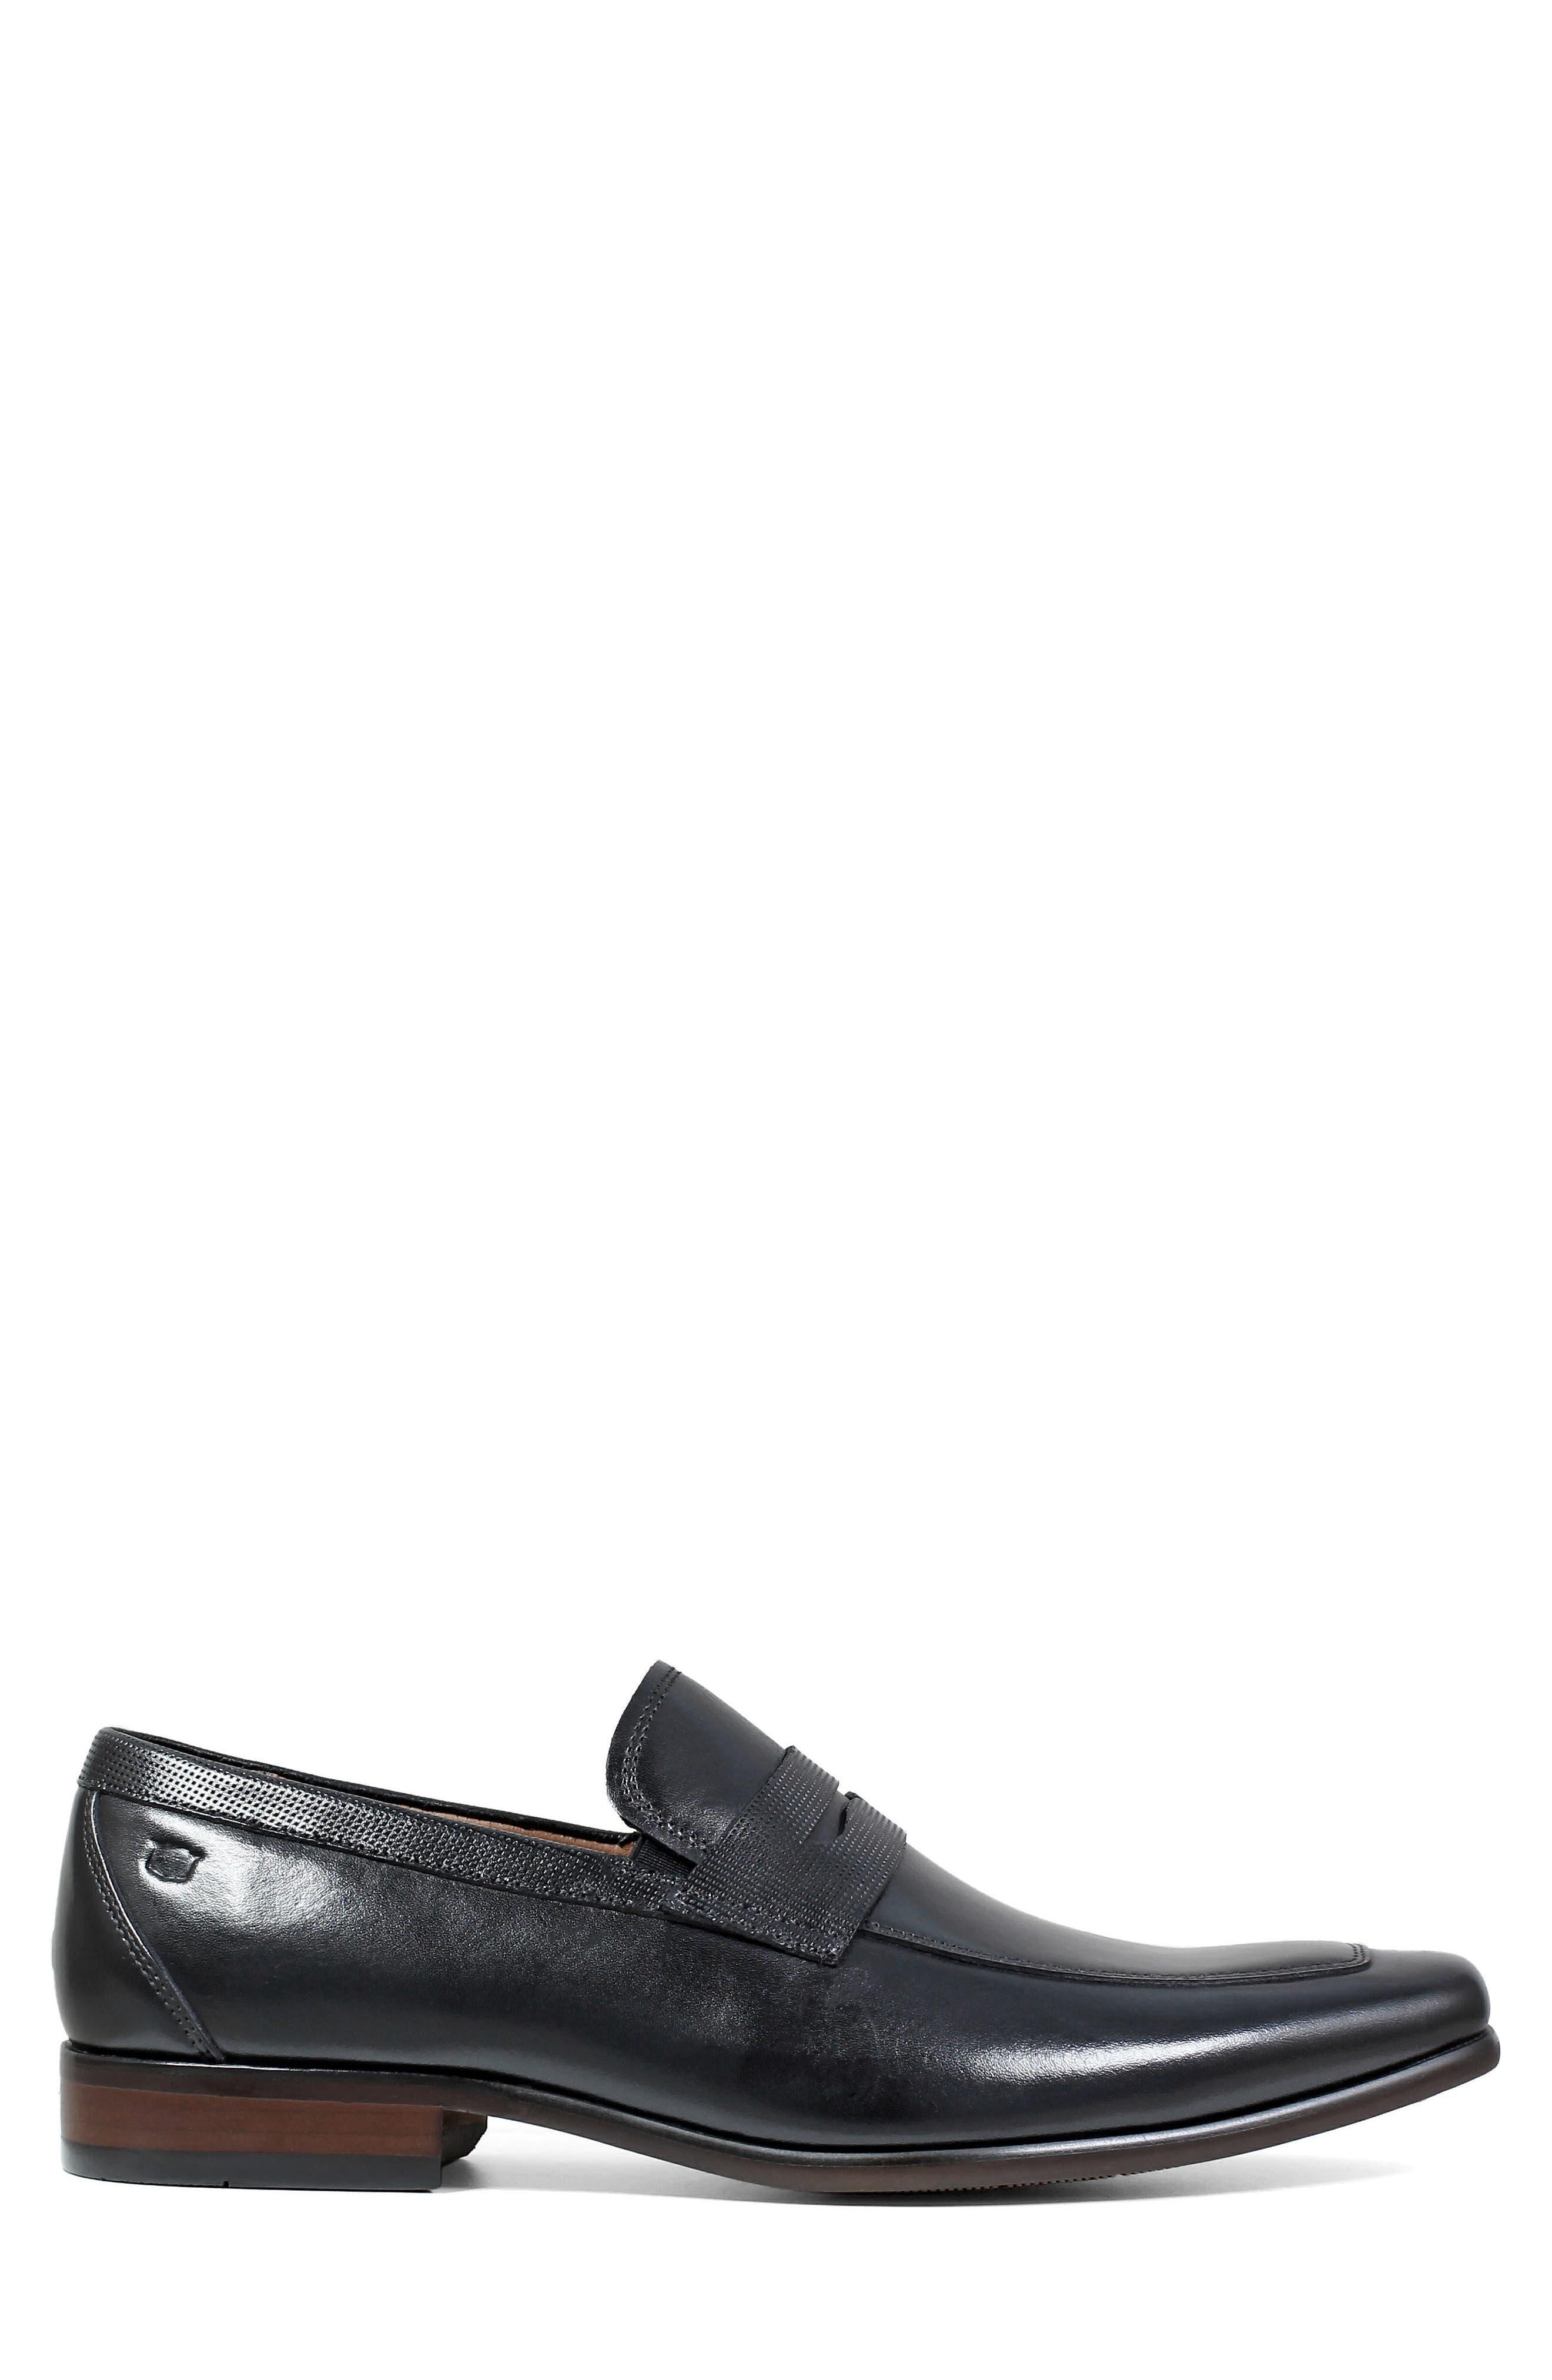 FLORSHEIM, Postino Apron Toe Textured Penny Loafer, Alternate thumbnail 2, color, BLACK LEATHER